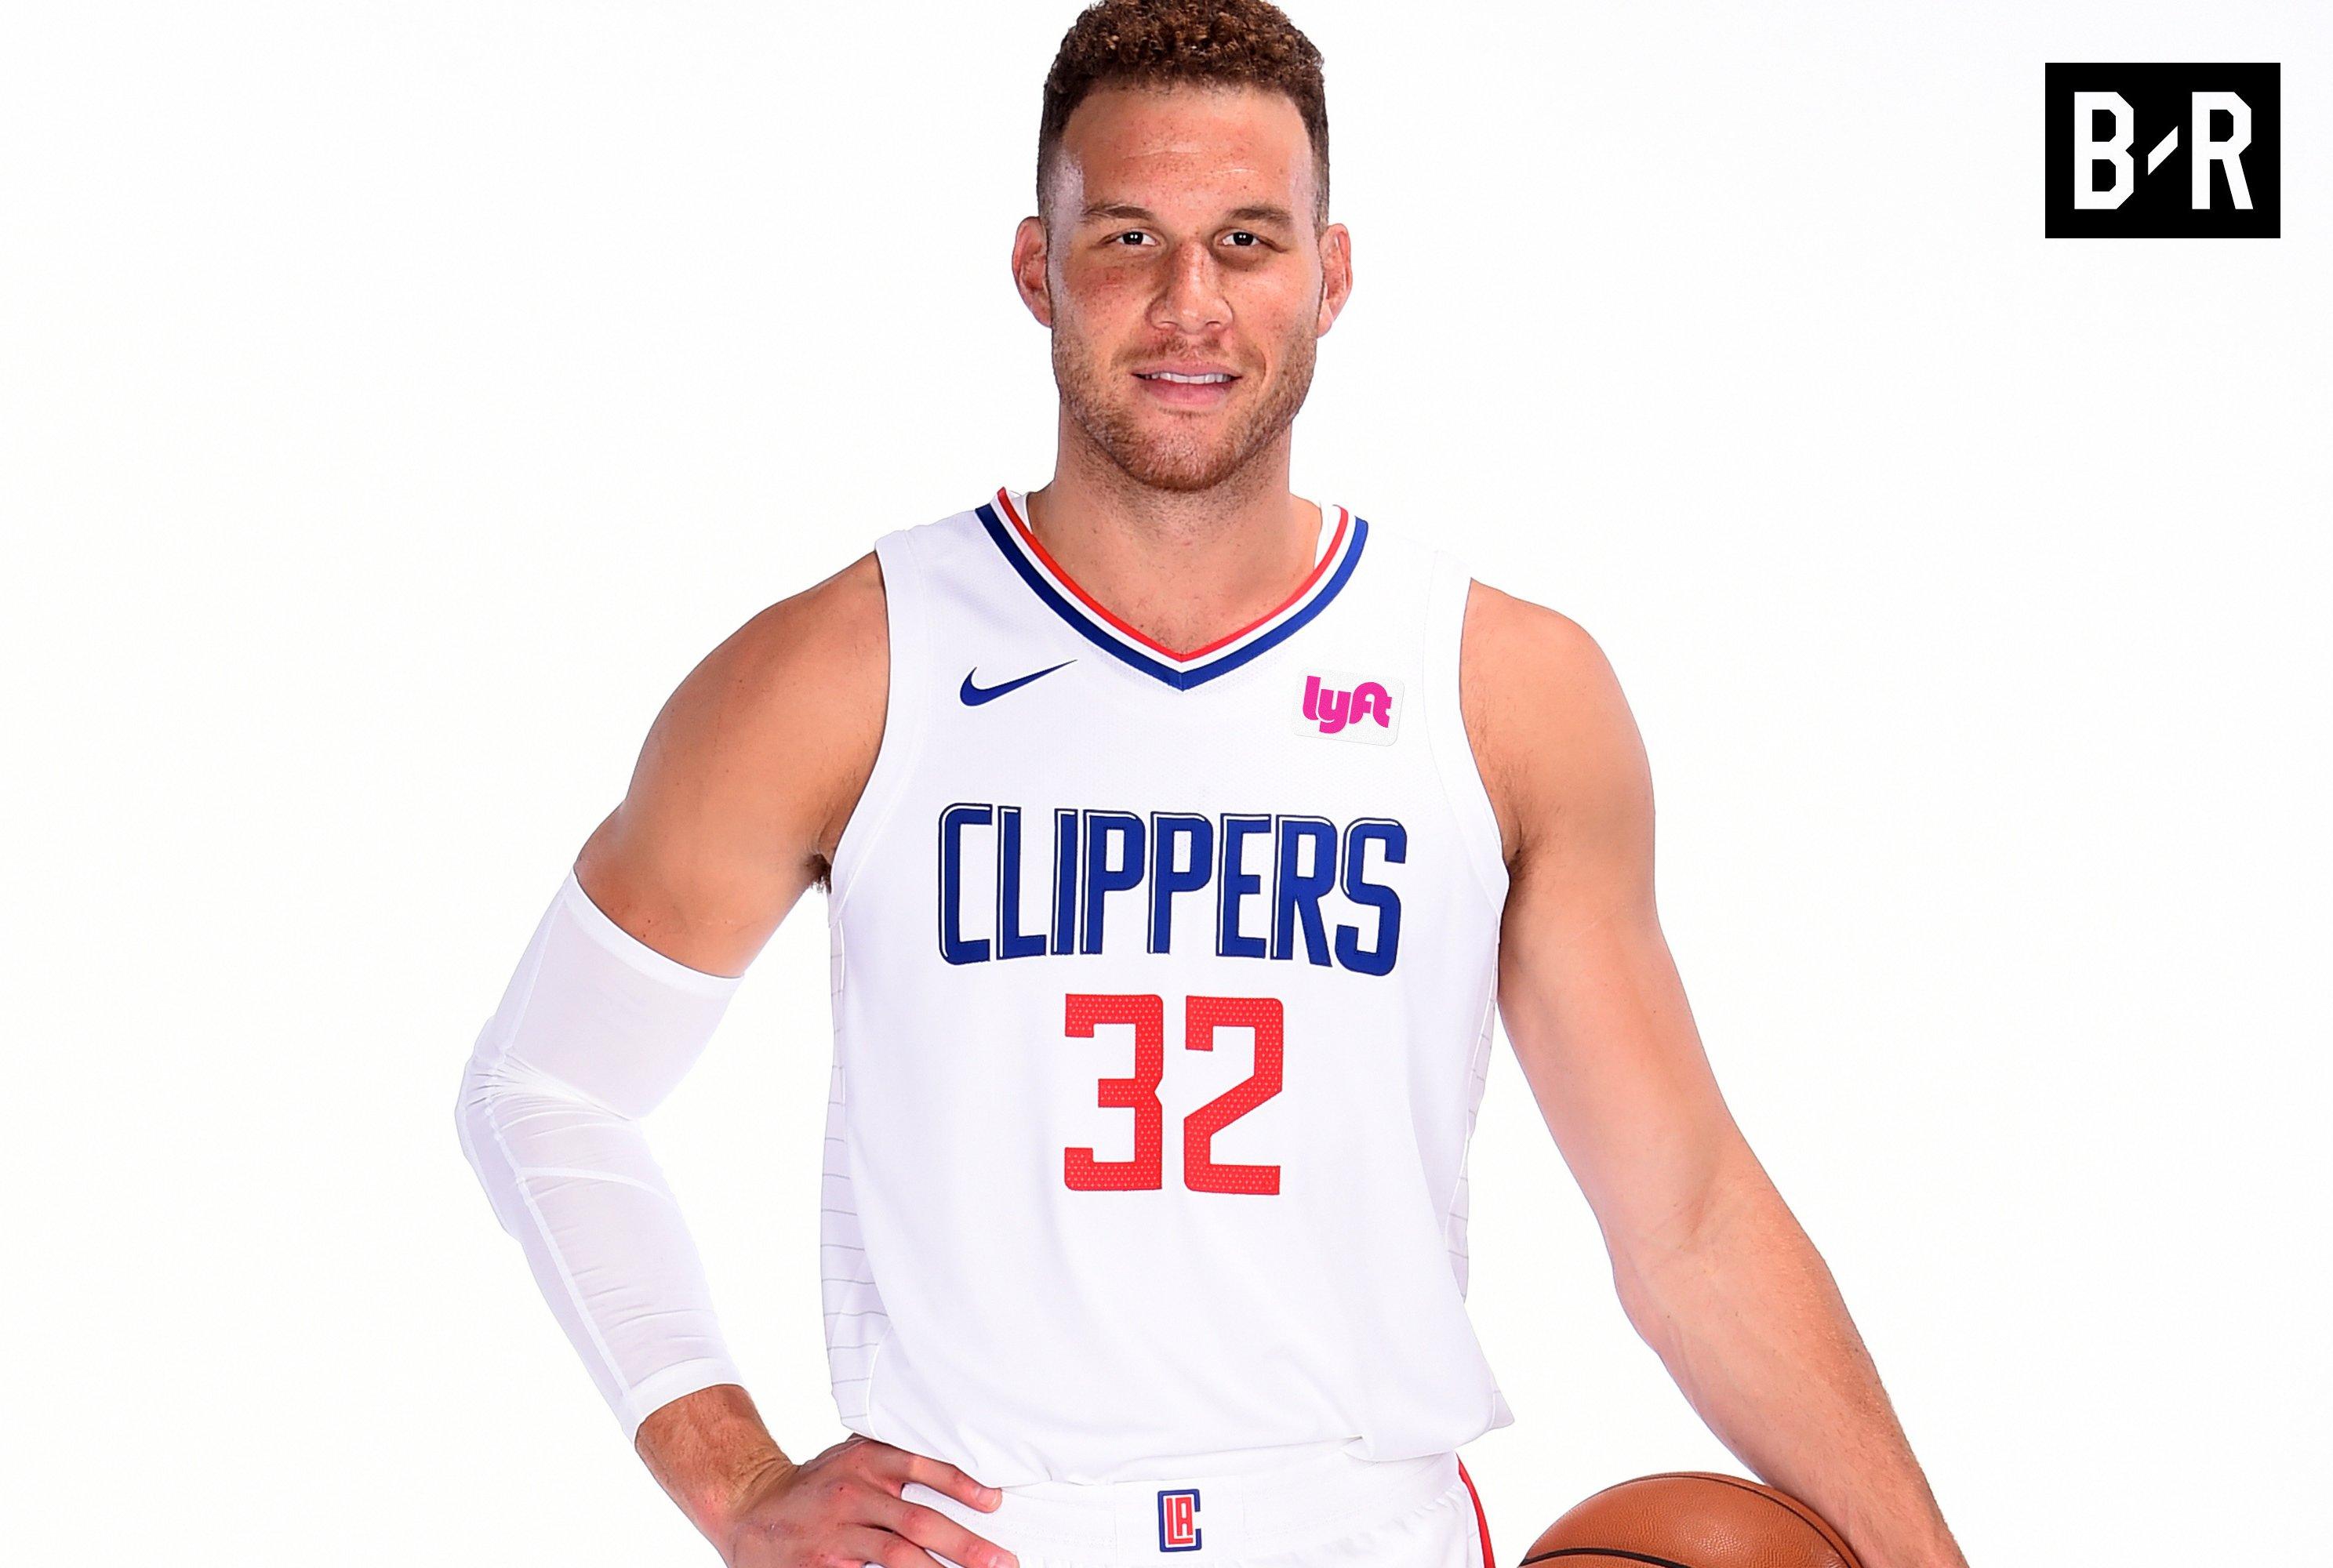 new products fe722 b4132 NBA Jersey Sponsors That Actually Make Sense | Bleacher ...